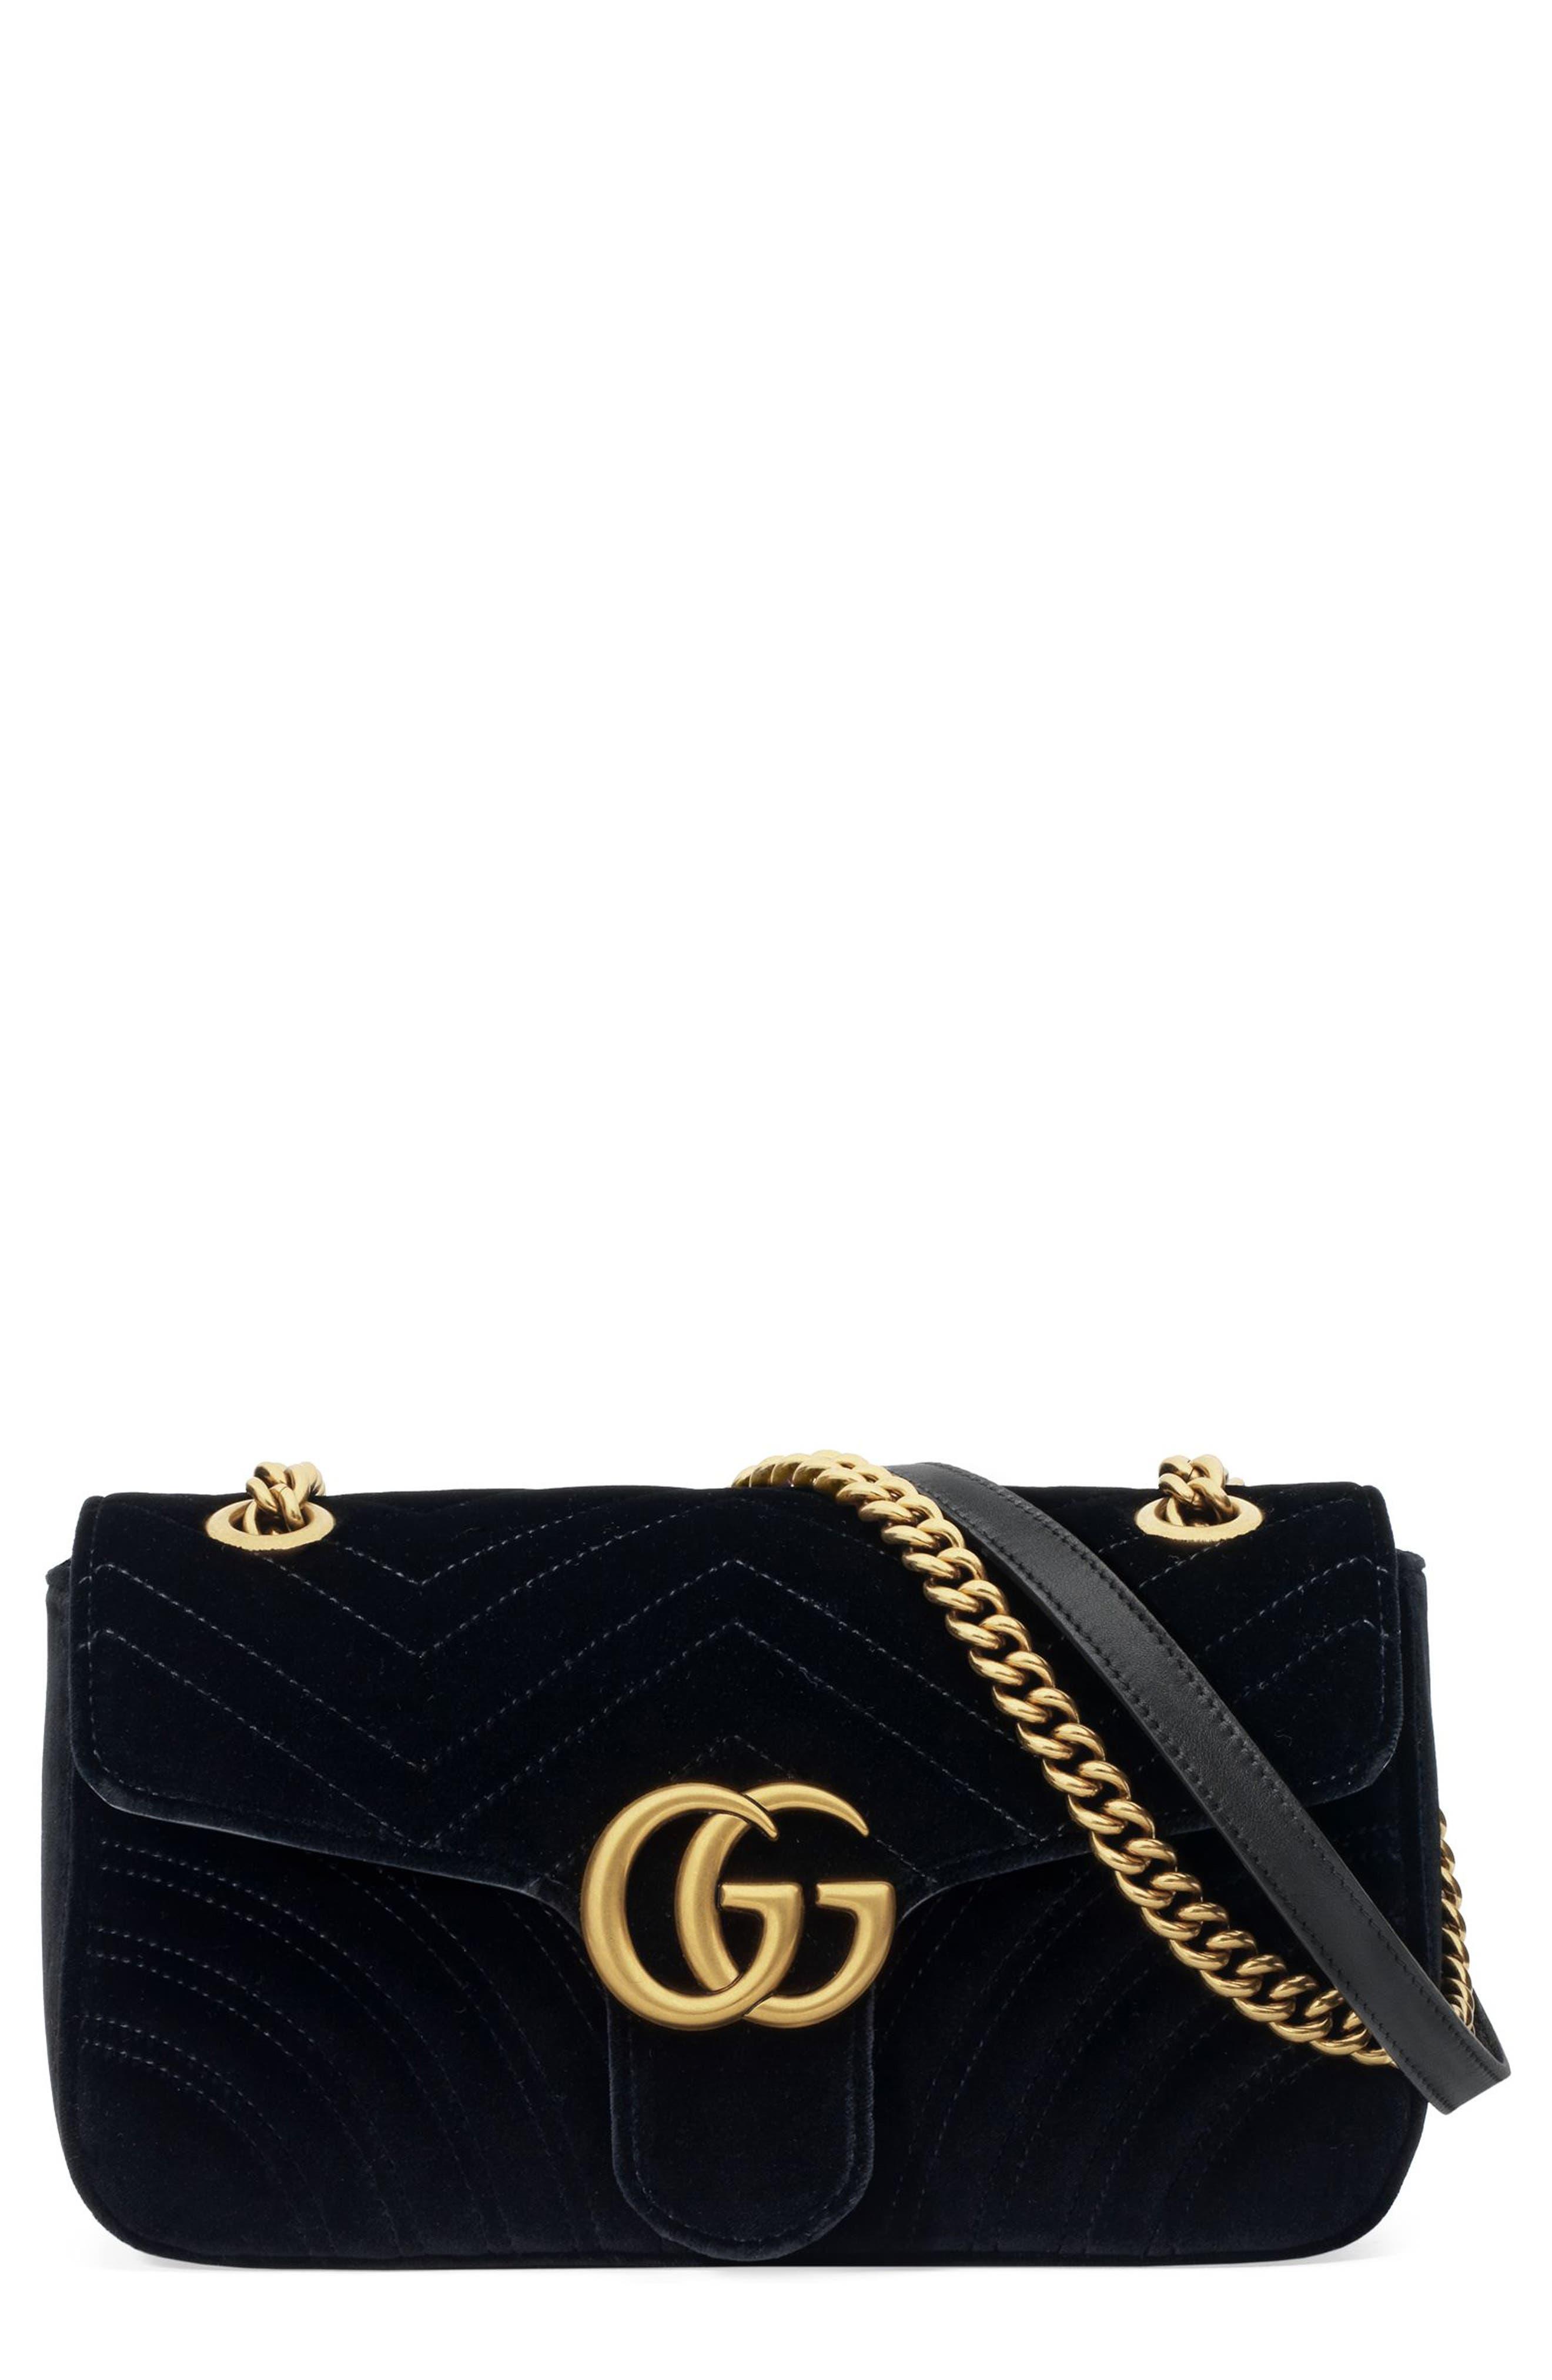 Medium GG Marmont 2.0 Matelassé Velvet Shoulder Bag,                             Main thumbnail 1, color,                             NERO